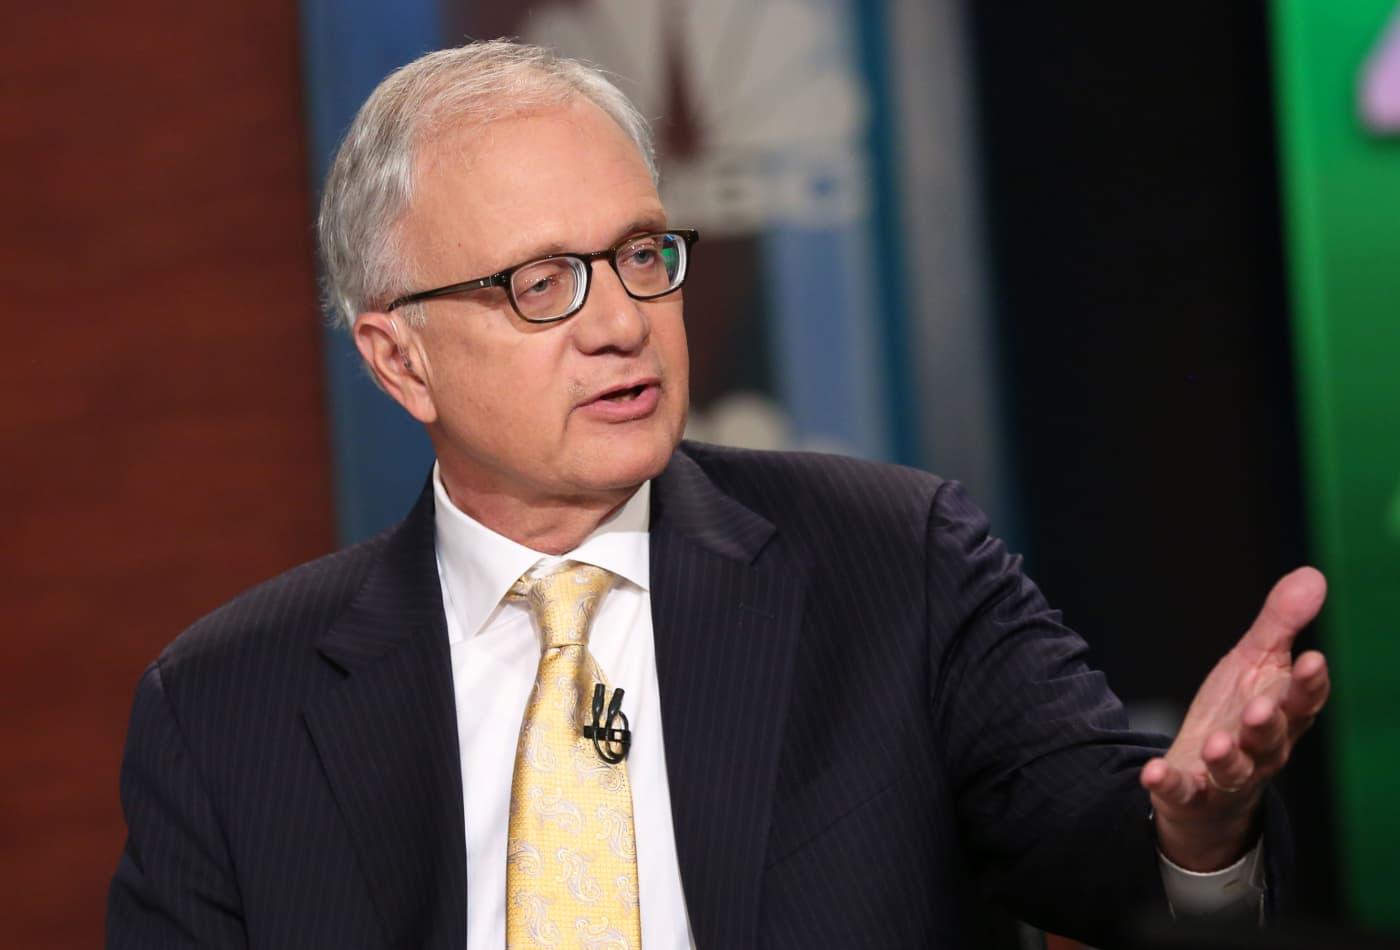 Stocks will soar 17% through next year, market bull Ed Yardeni predicts